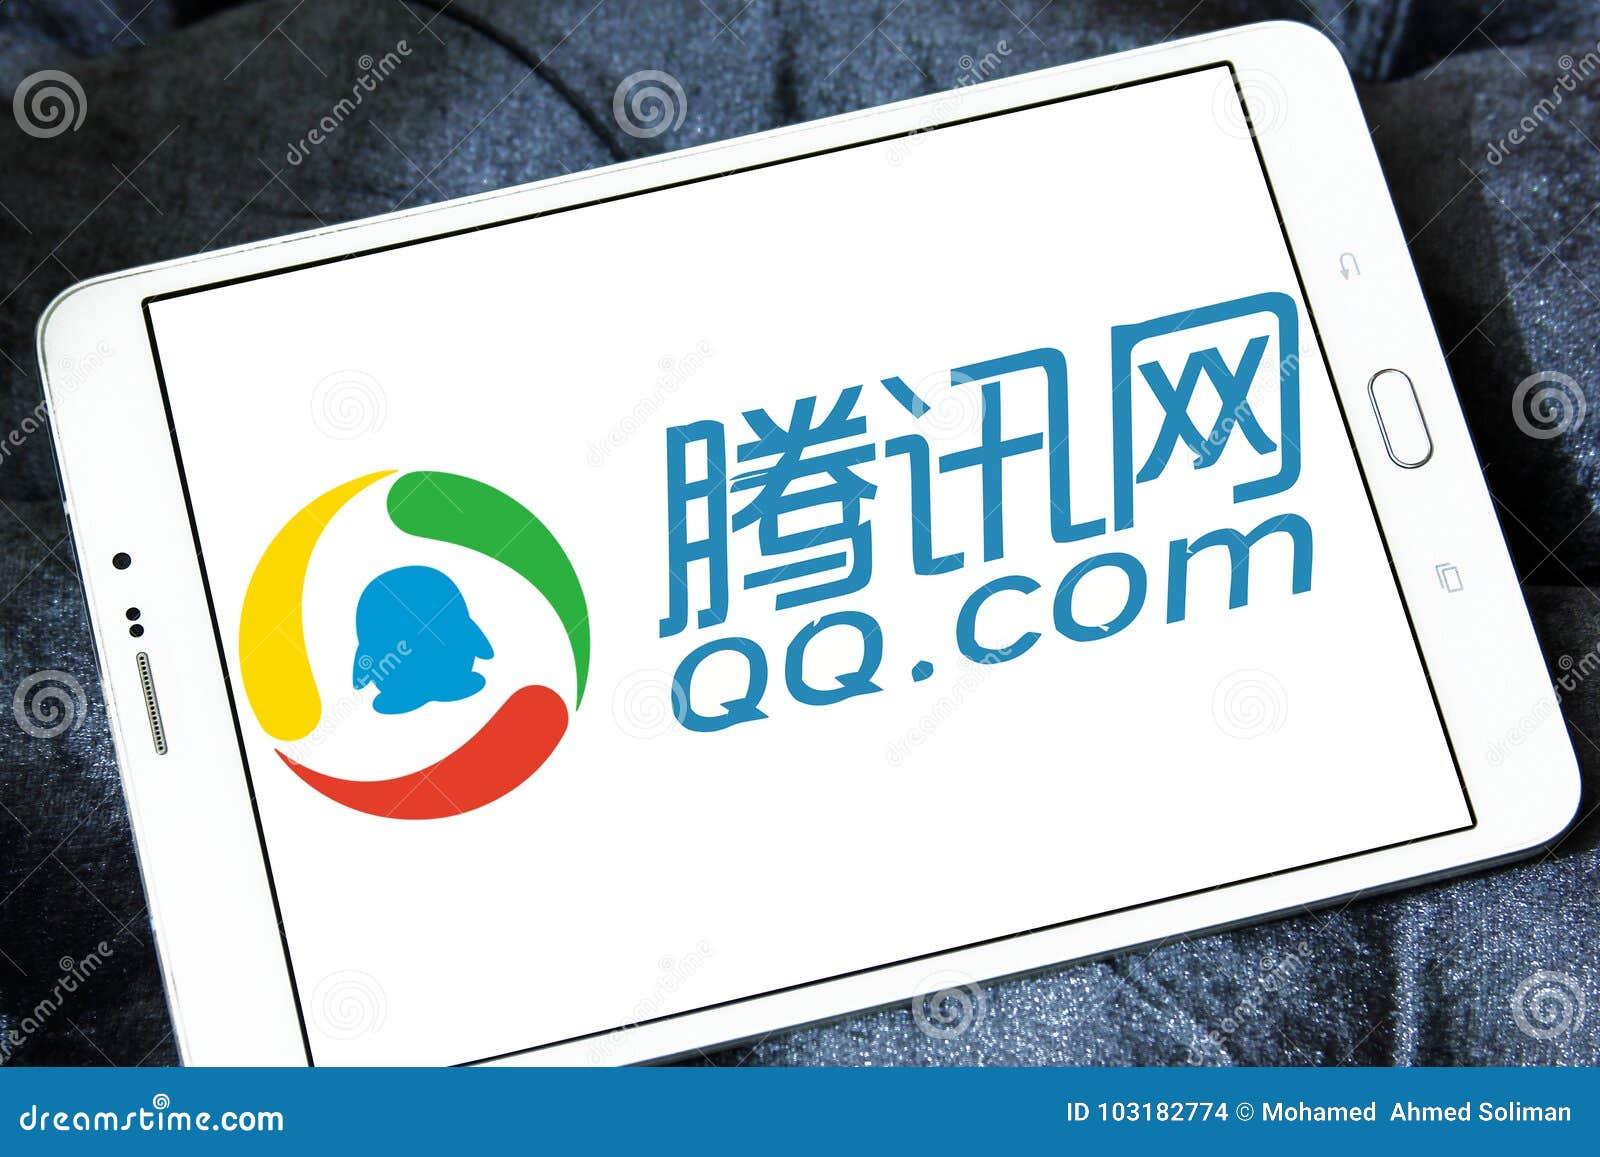 Qq Com Logo Editorial Stock Image Image Of Provide 103182774